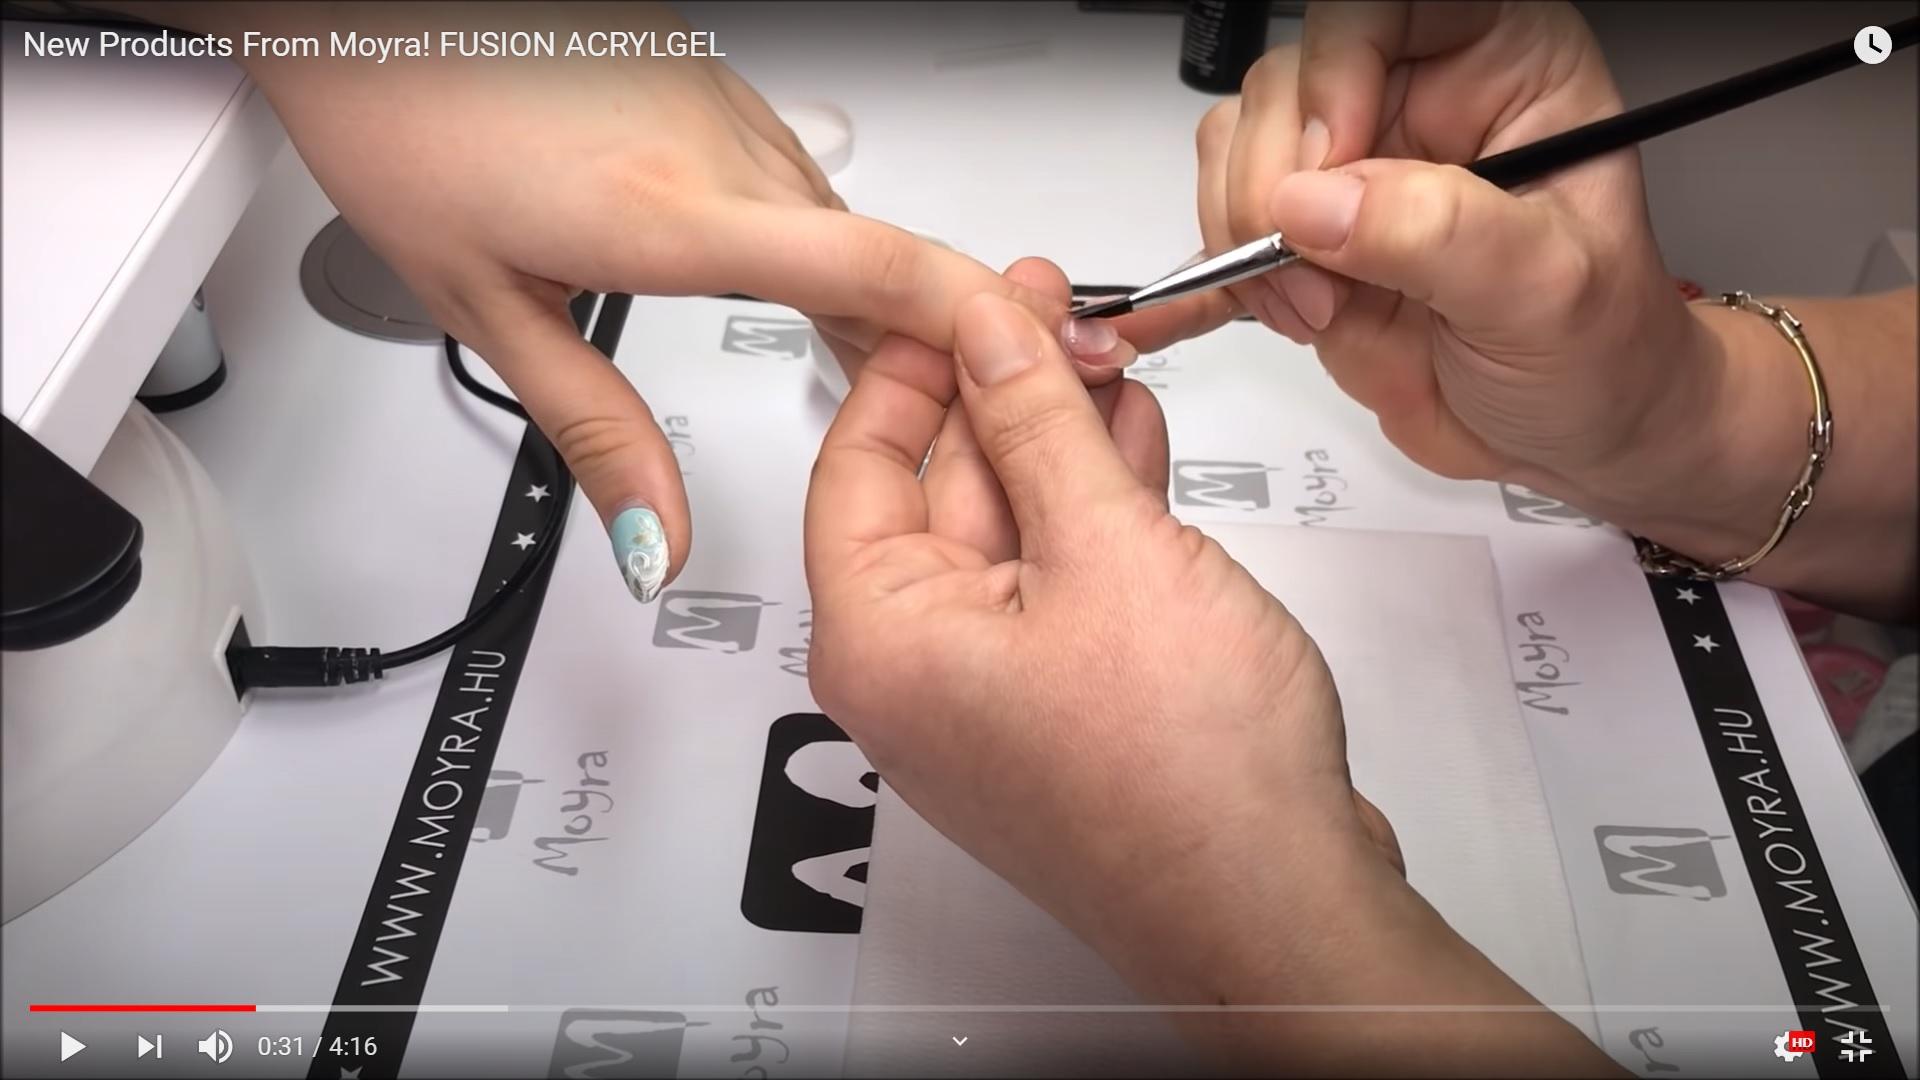 Moyra Fusion Acrylgel